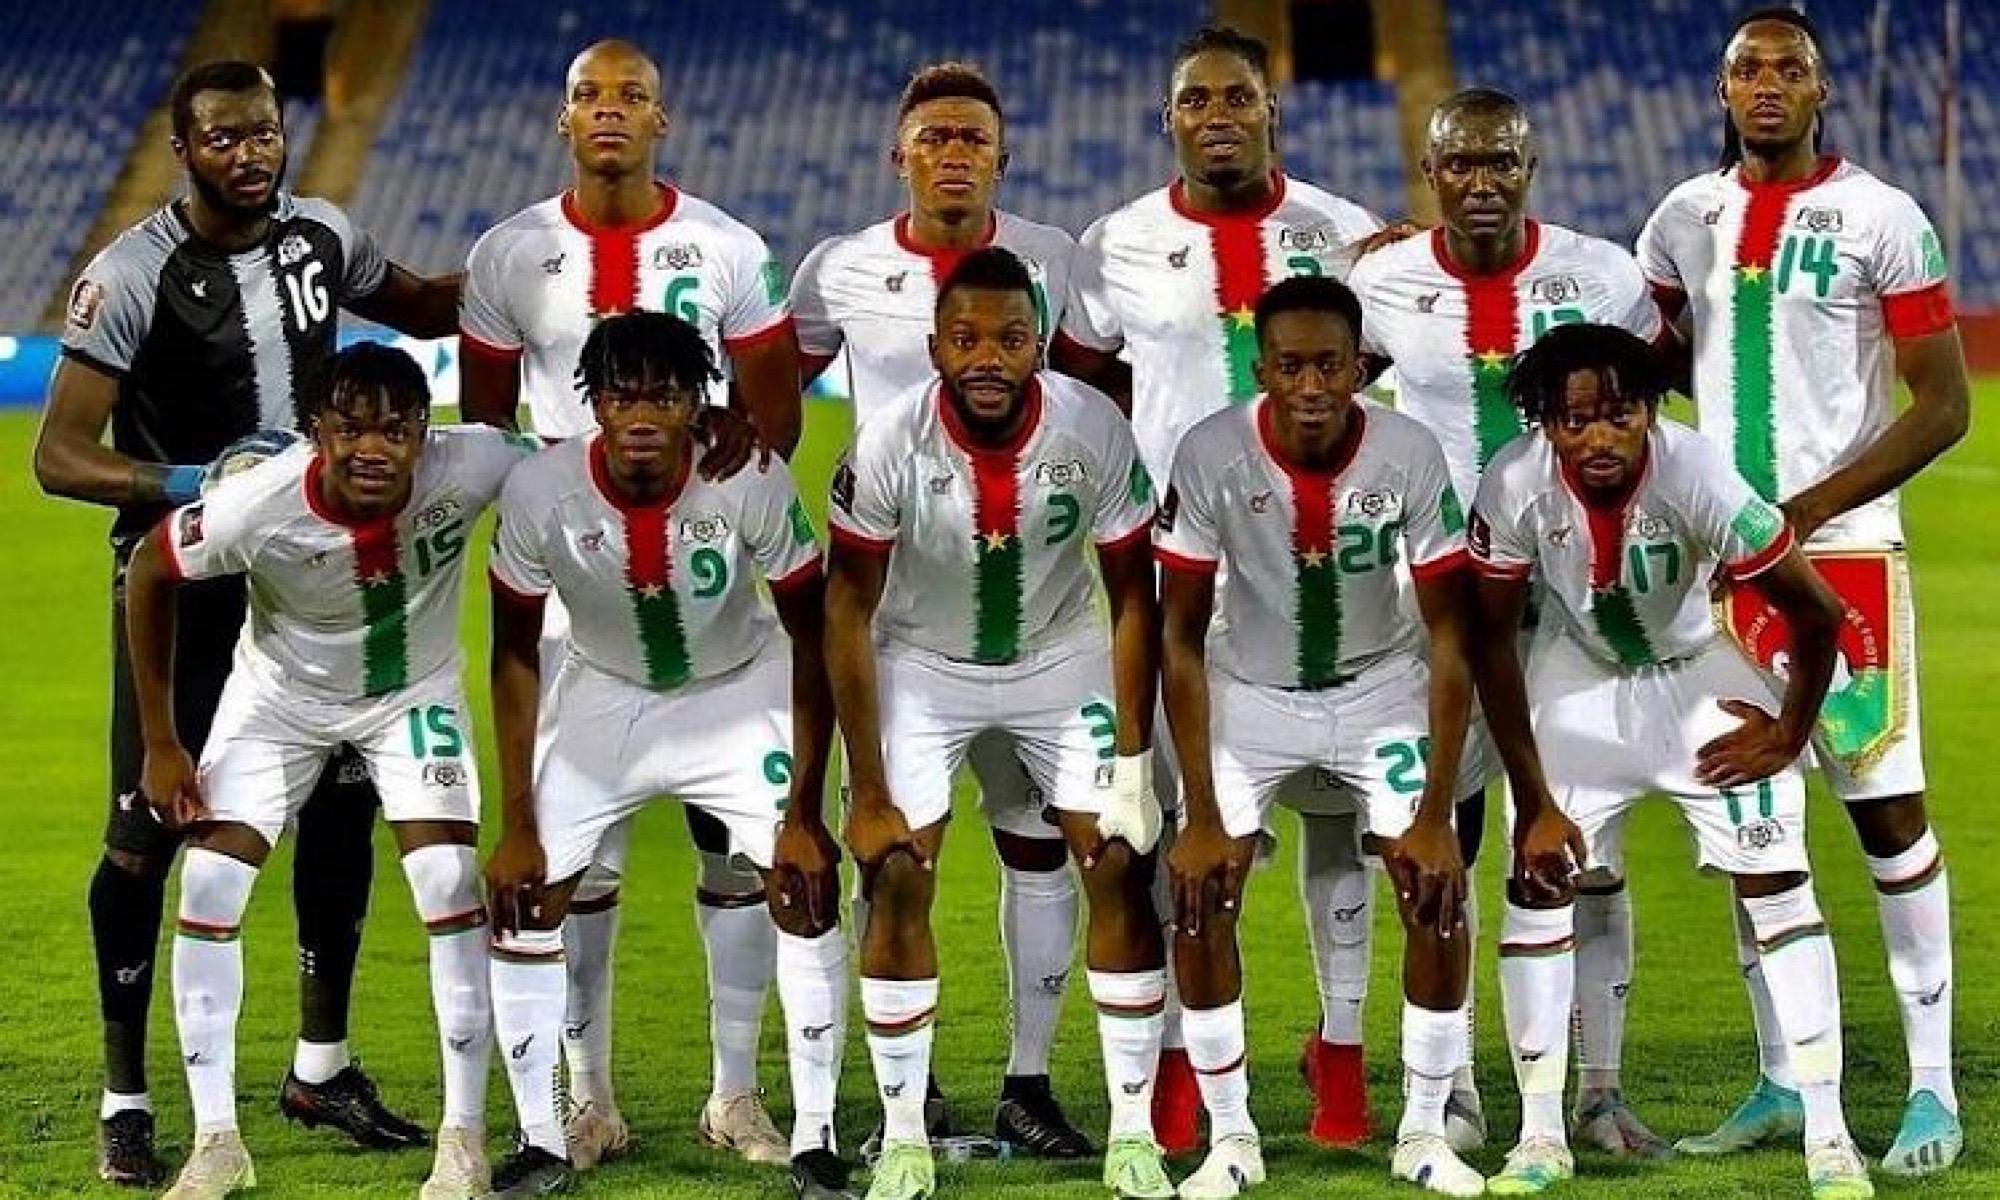 Burkina Faso Djibouti